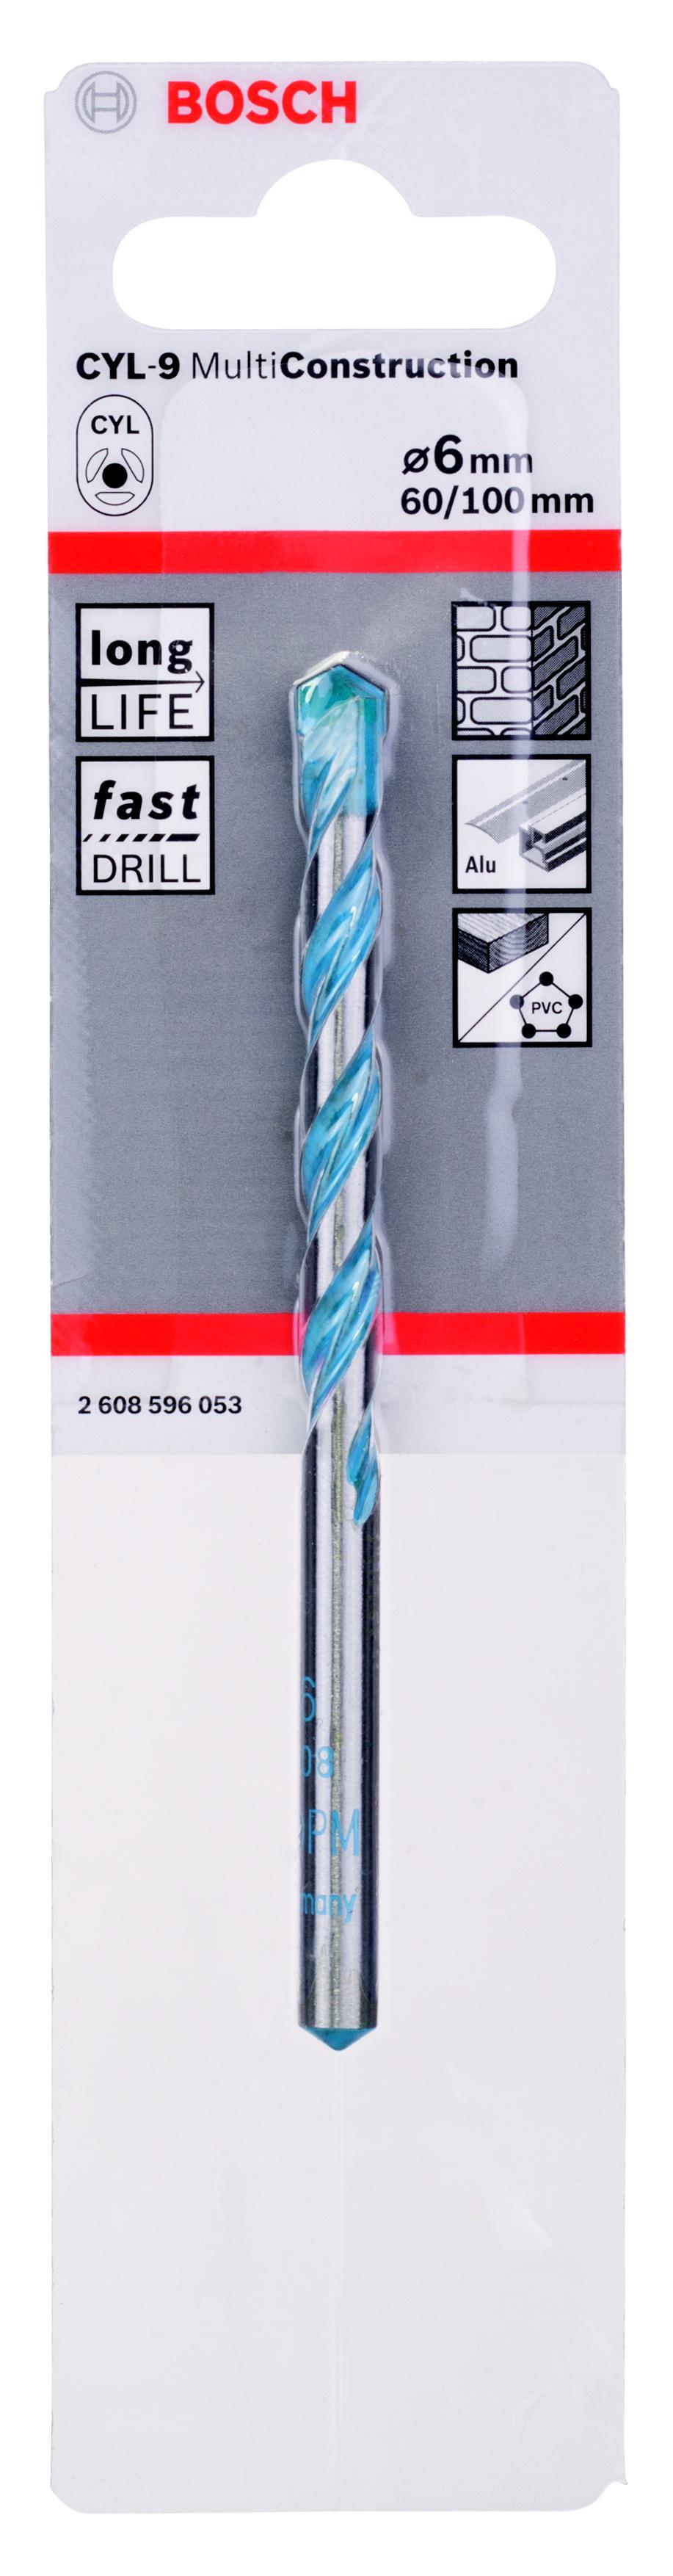 Сверло универсальное Bosch Ф6х100мм (cyl-9 multi construction 2608596053) сверло универсальное bosch multi construction cyl 9 6x100 мм 2608596053